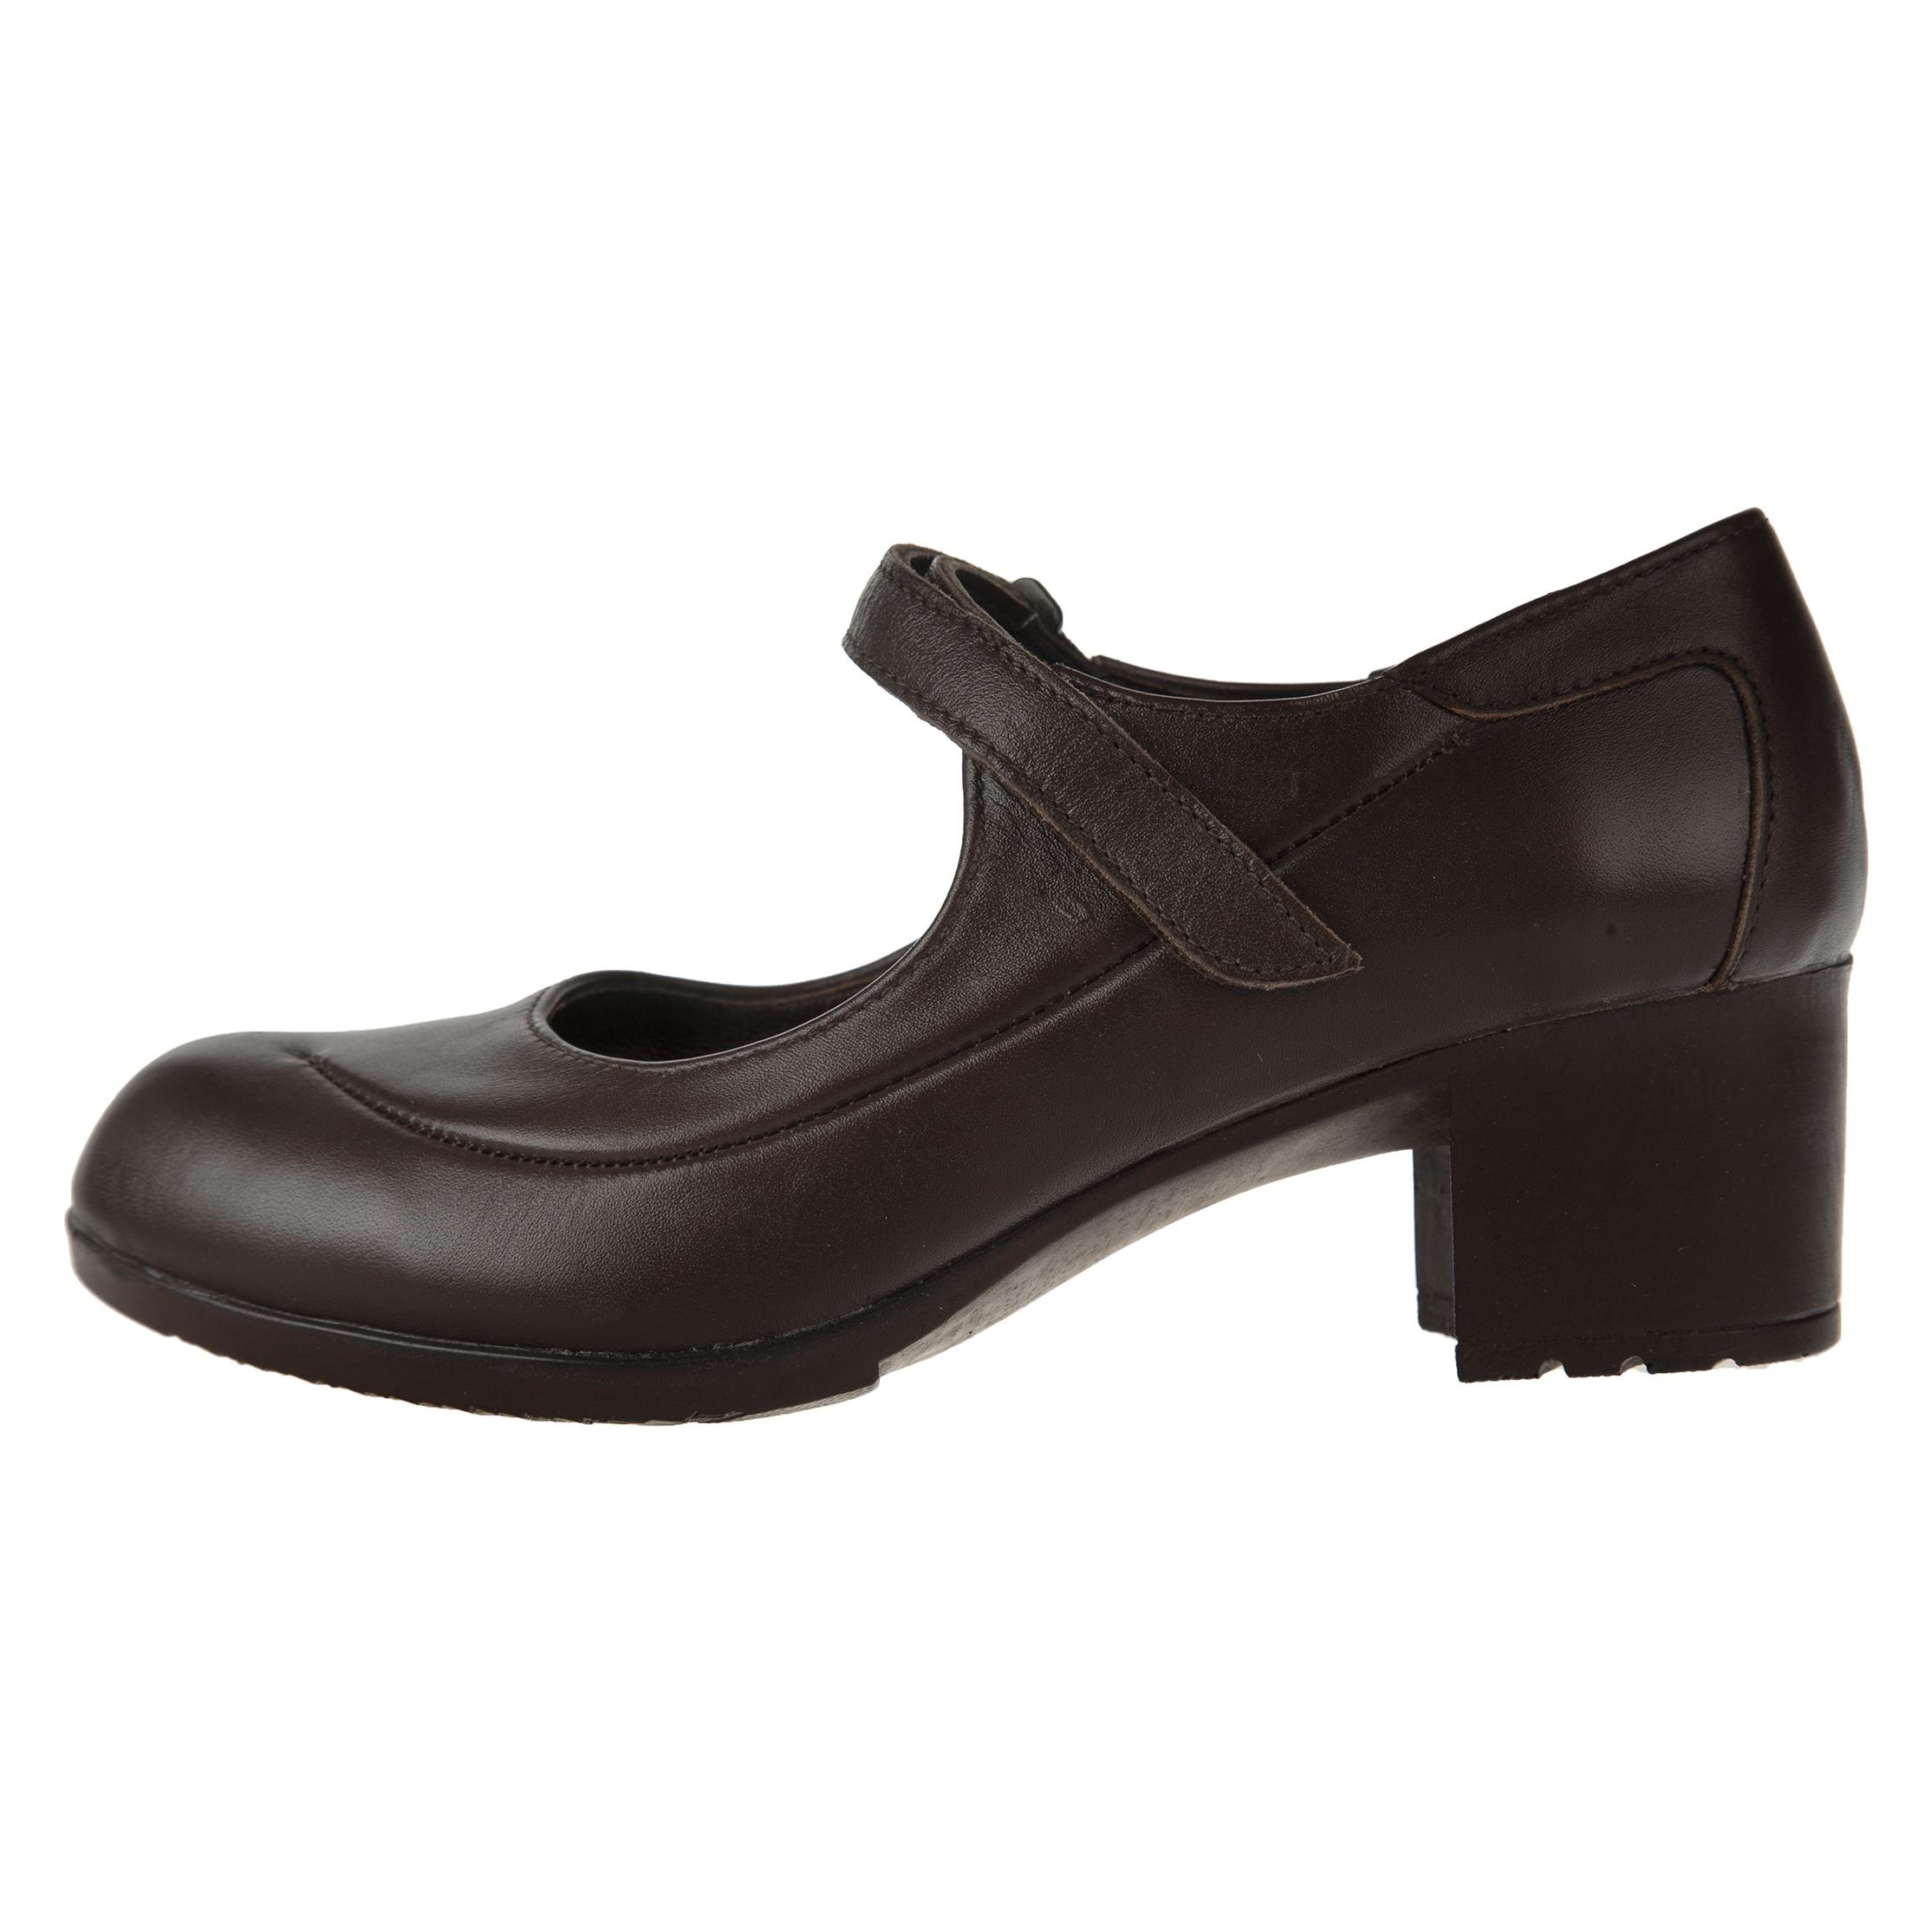 تصویر کفش زنانه بلوط مدل BT5144A-104